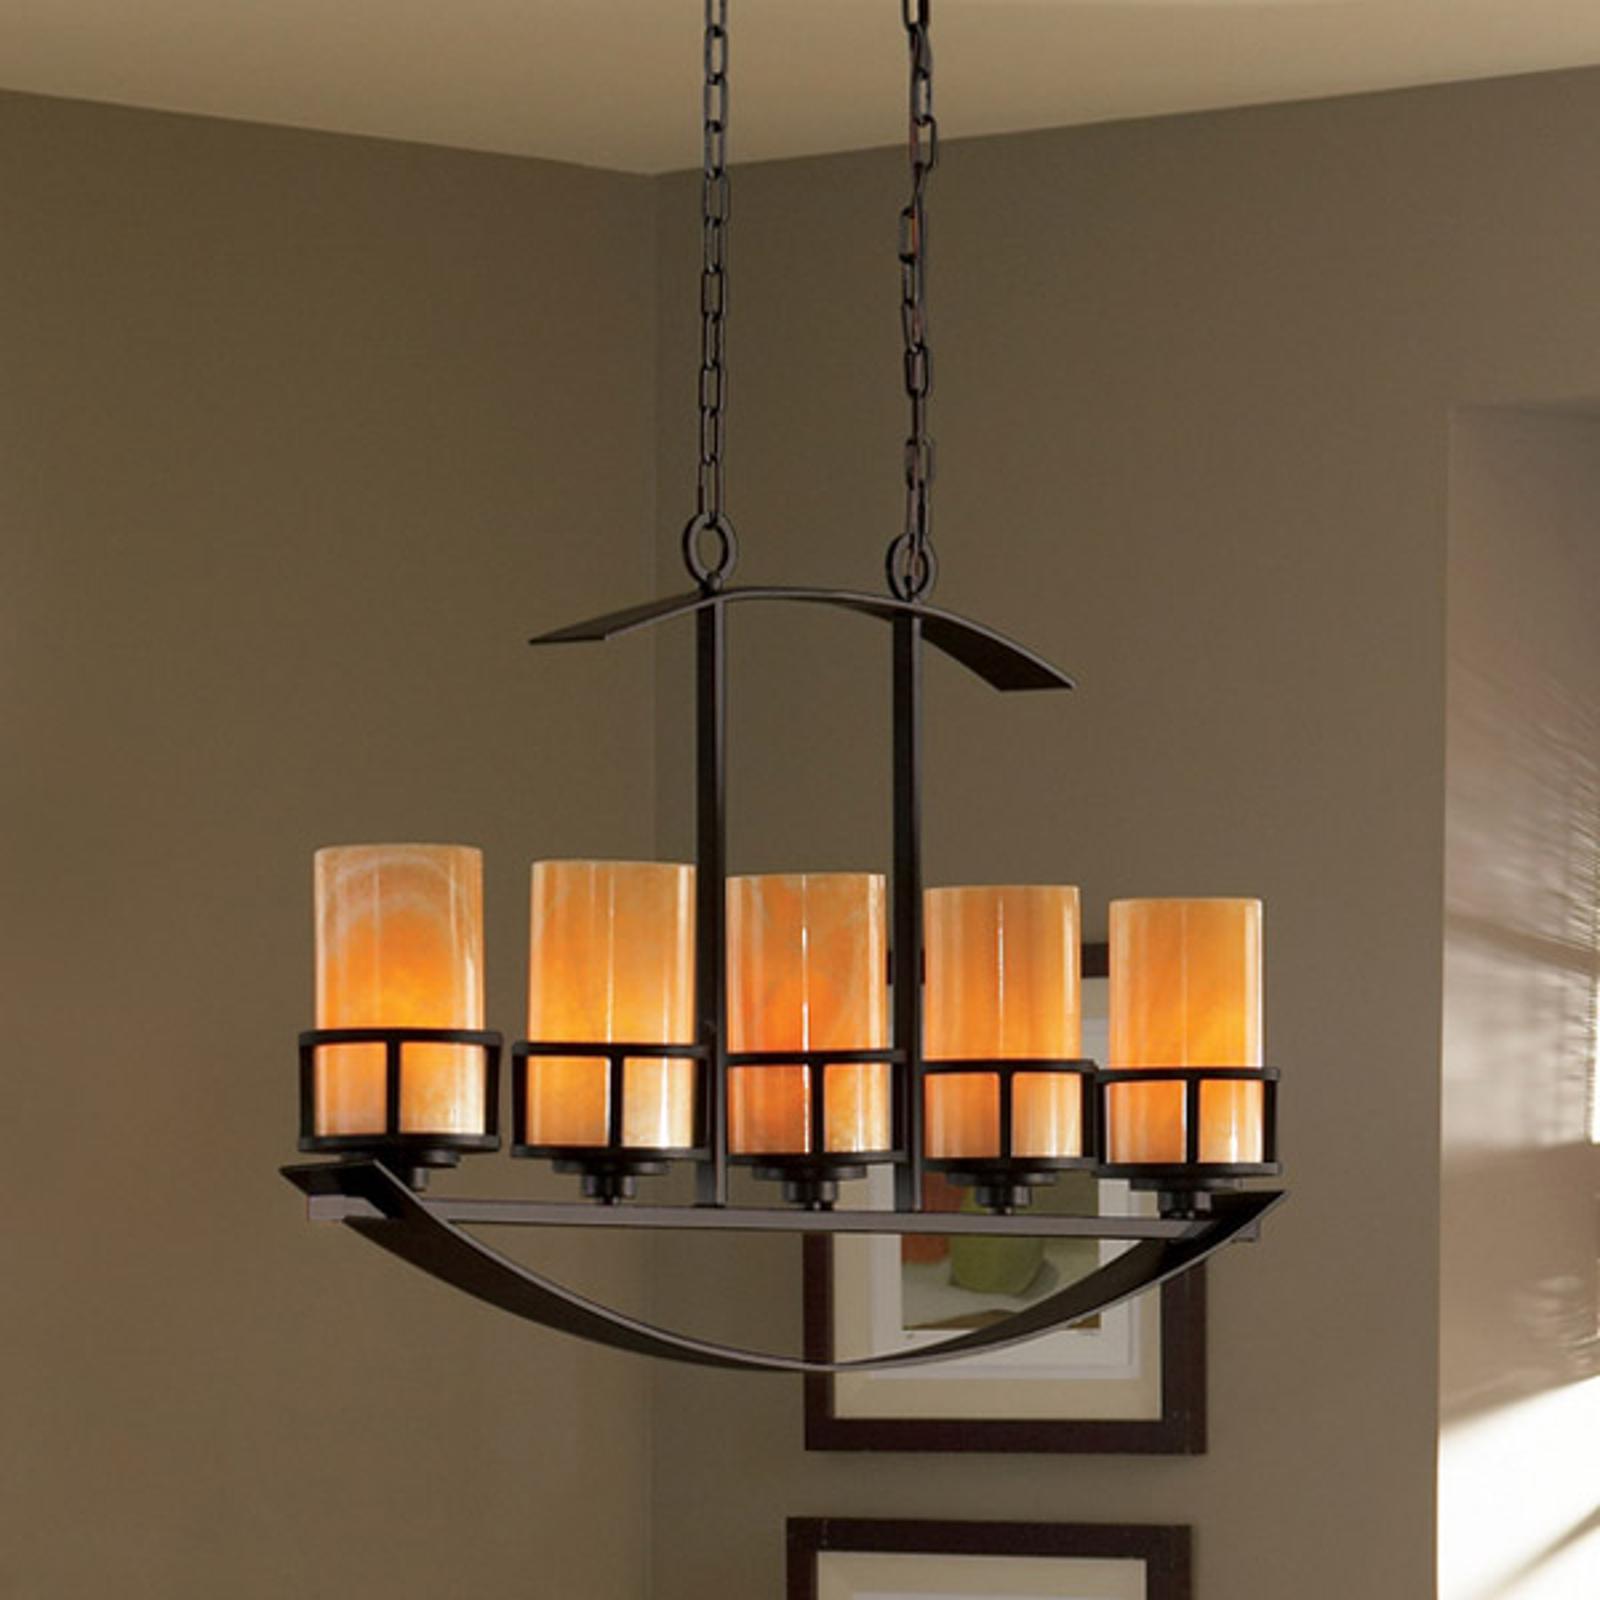 Lange hanglamp Kyle m. 5 onyx-kappen